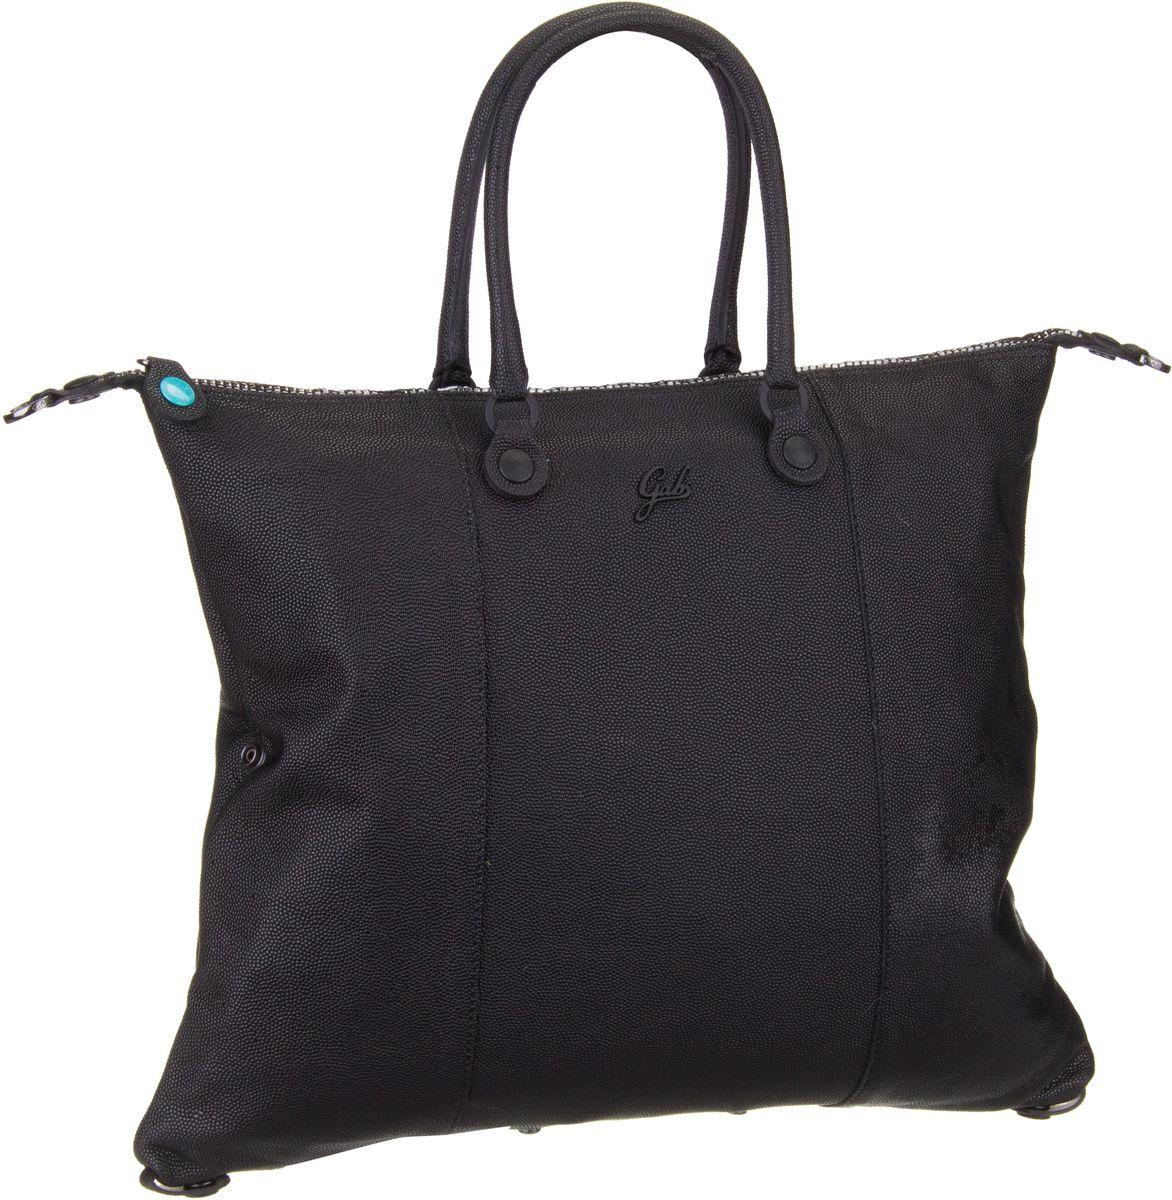 Handtasche Tania Thin Handles Black Medium Nero Gabs hMxLnC